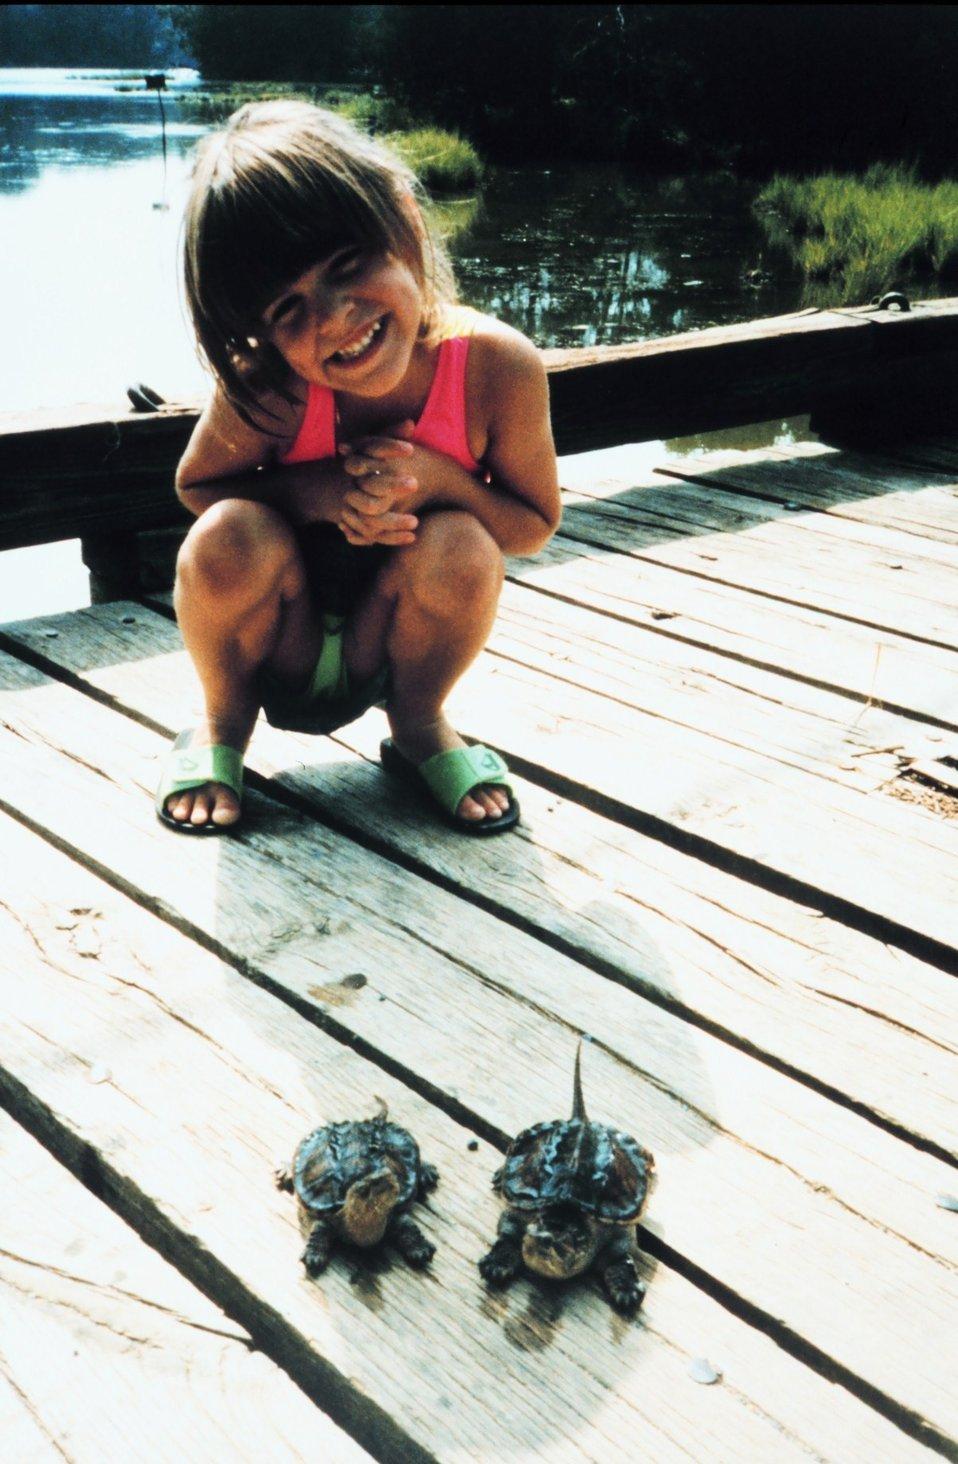 Juvenile human inspecting juvenile alligator snapping turtles.